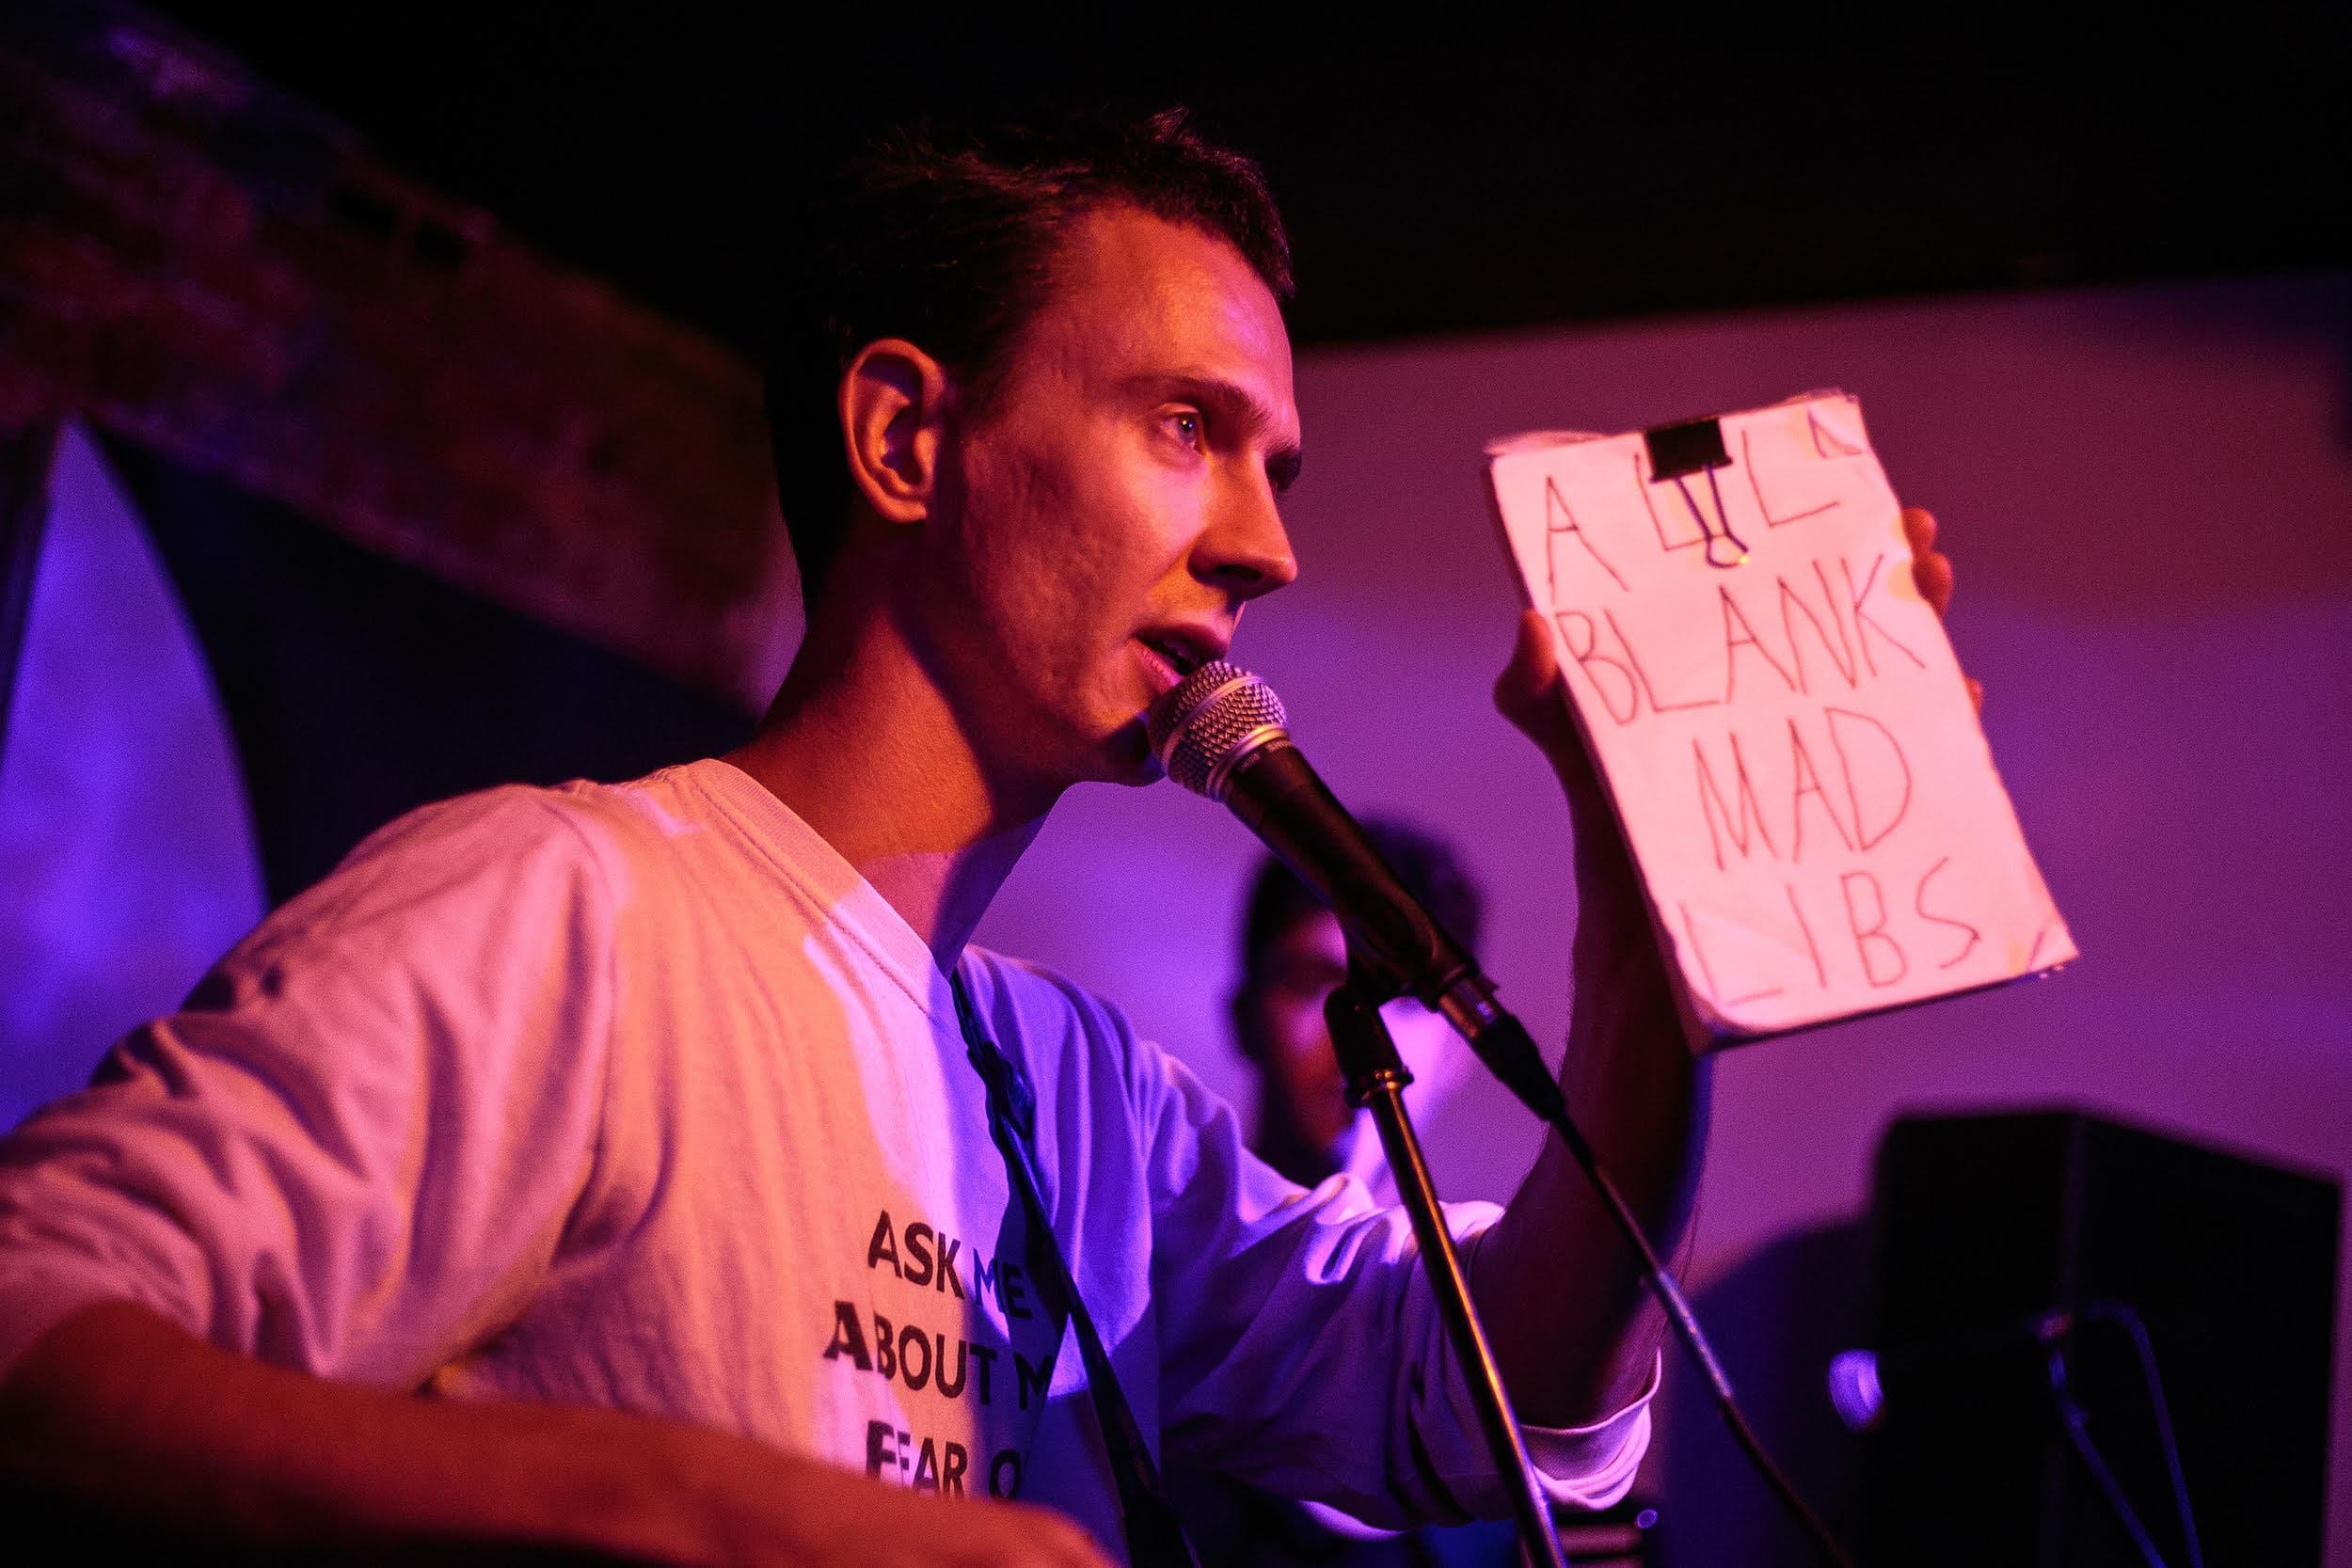 Noah Britton performing at the Dorchester Art Project. (Courtesy Ben Stas)